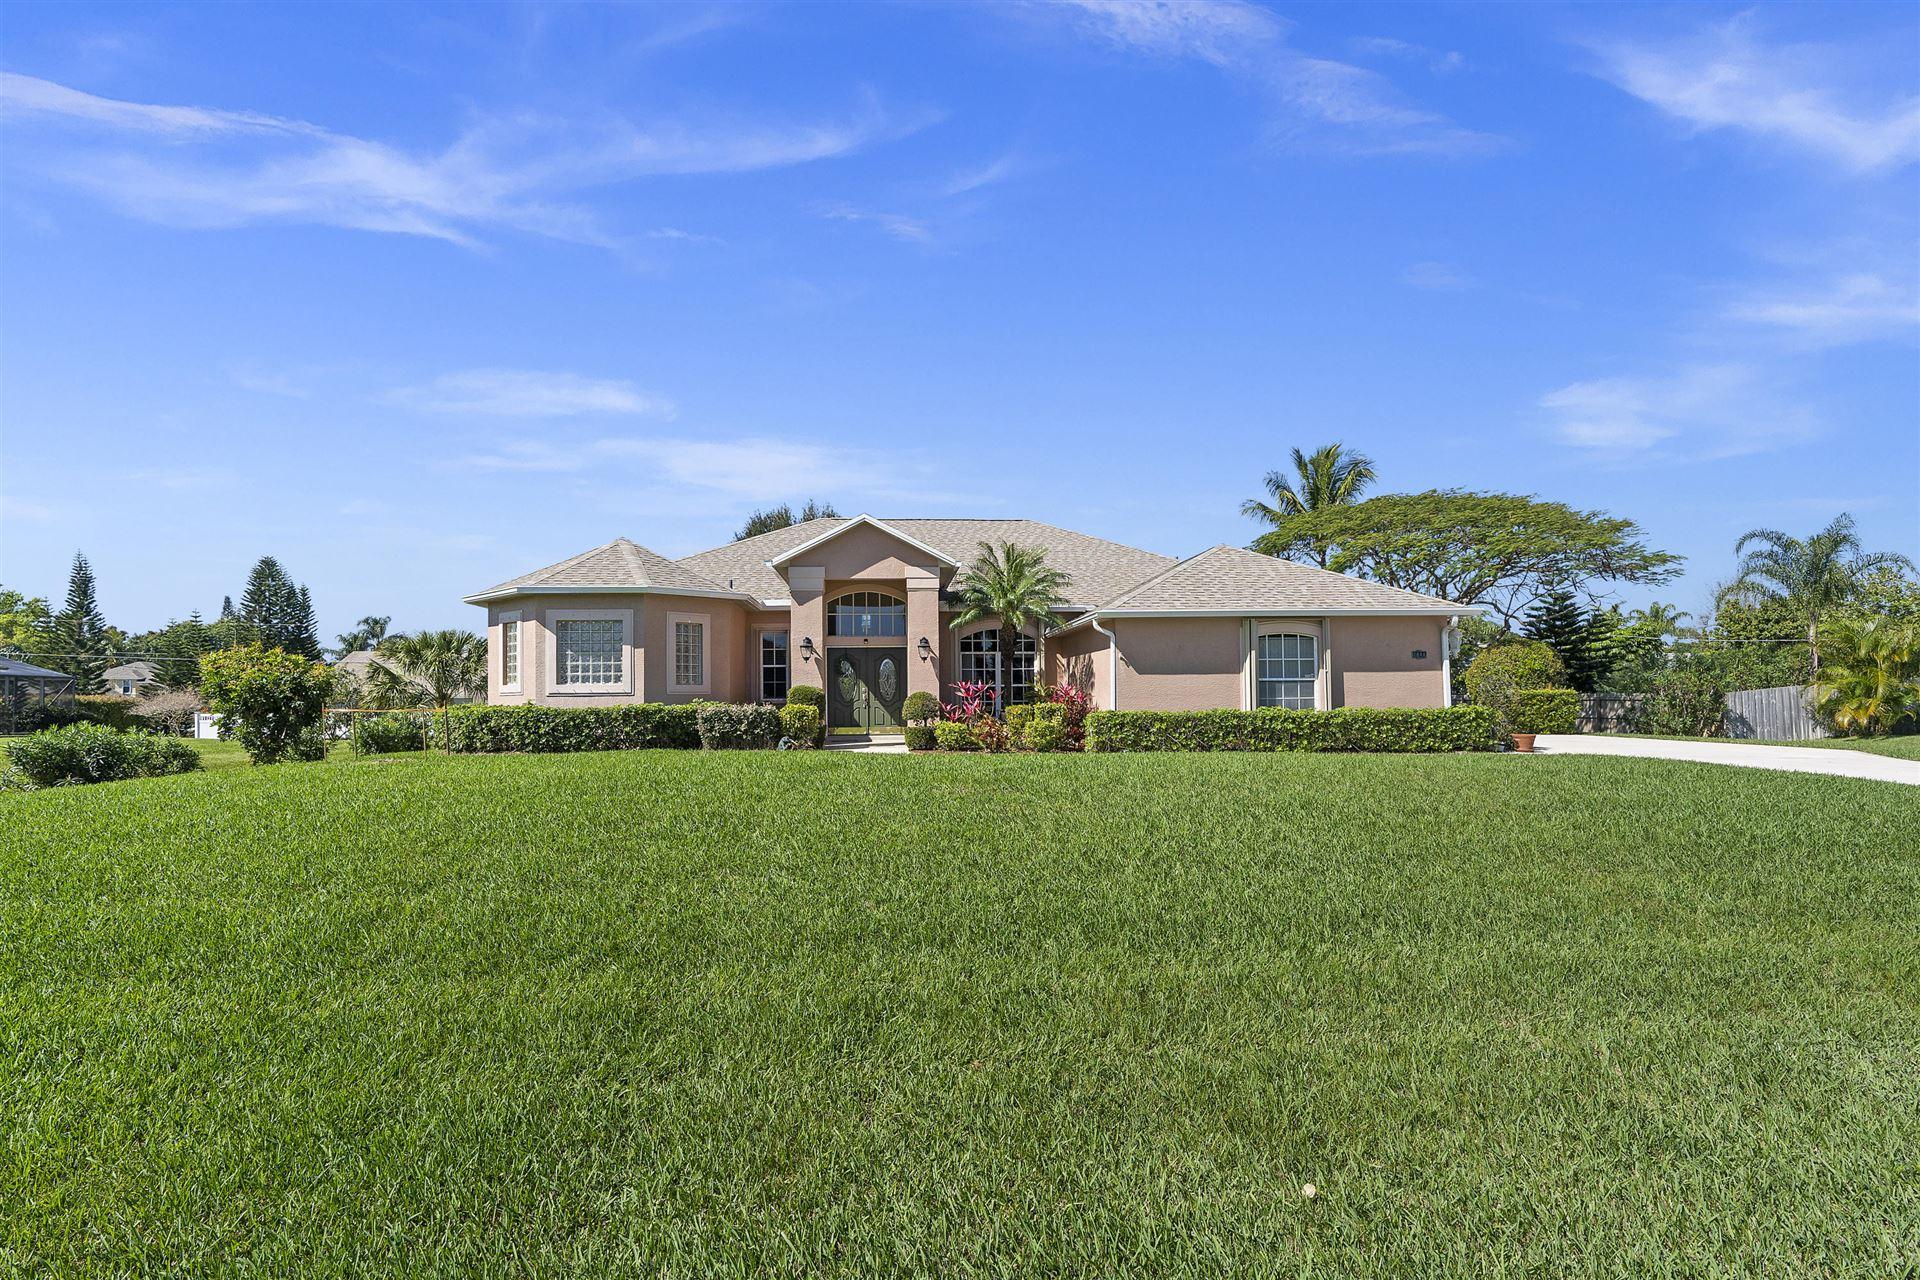 Photo of 2044 SE Morningside Boulevard, Port Saint Lucie, FL 34952 (MLS # RX-10697170)